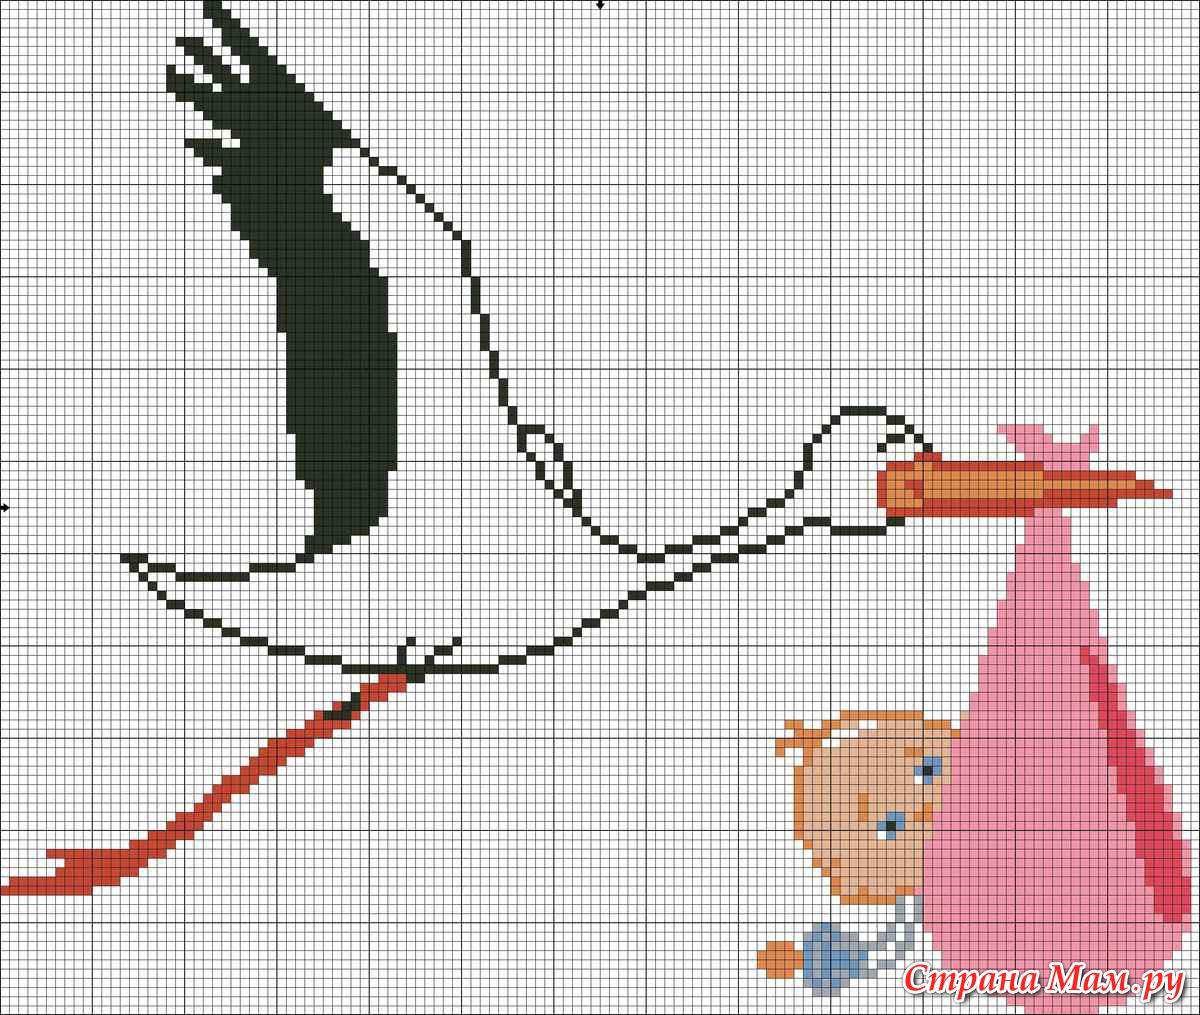 Вышивка аист с ребенком